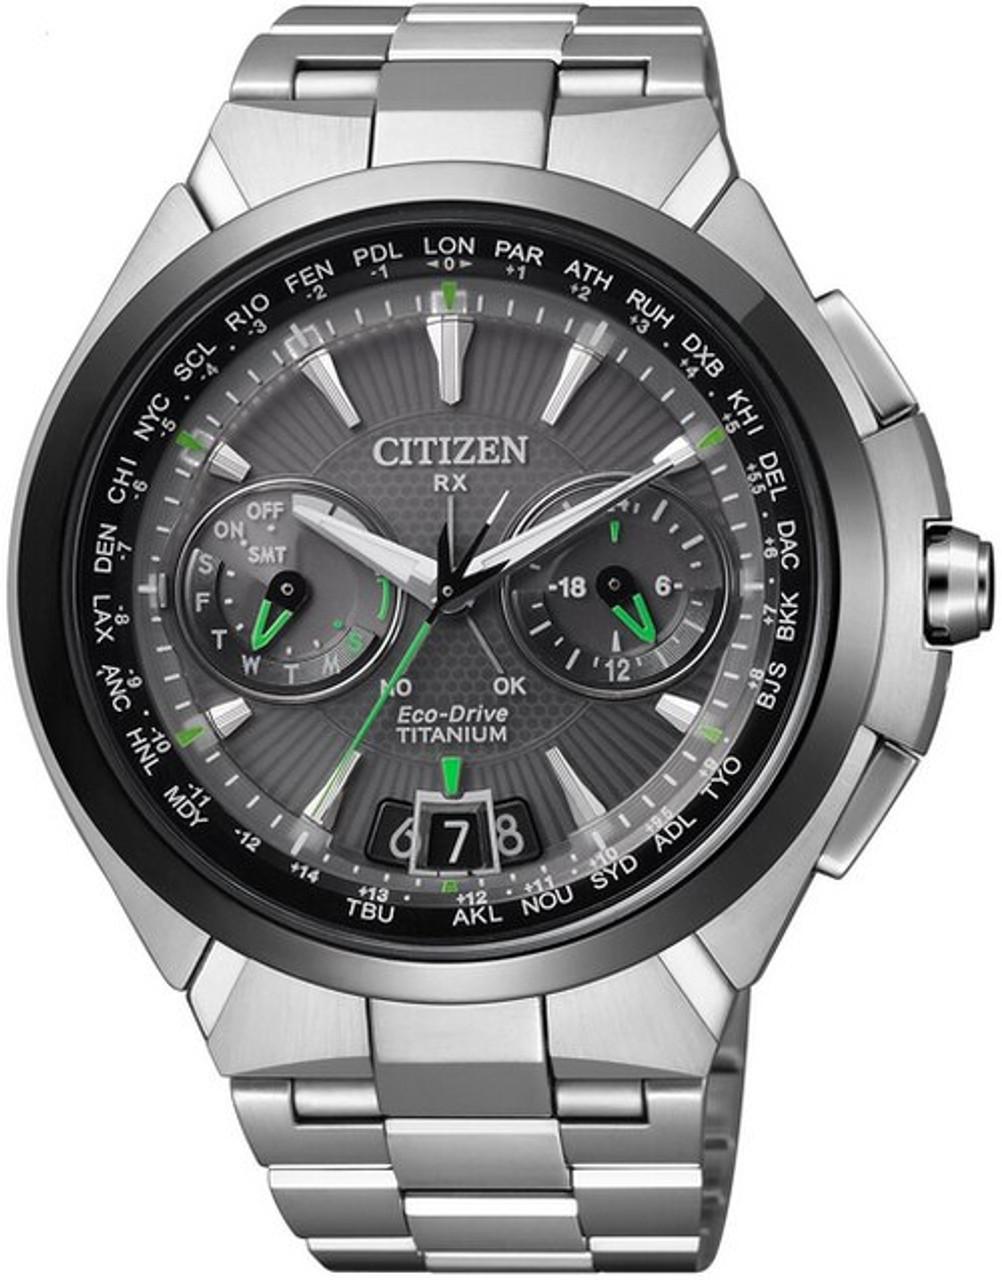 Citizen Attesa CC1086-50E Satellite Wave GPS